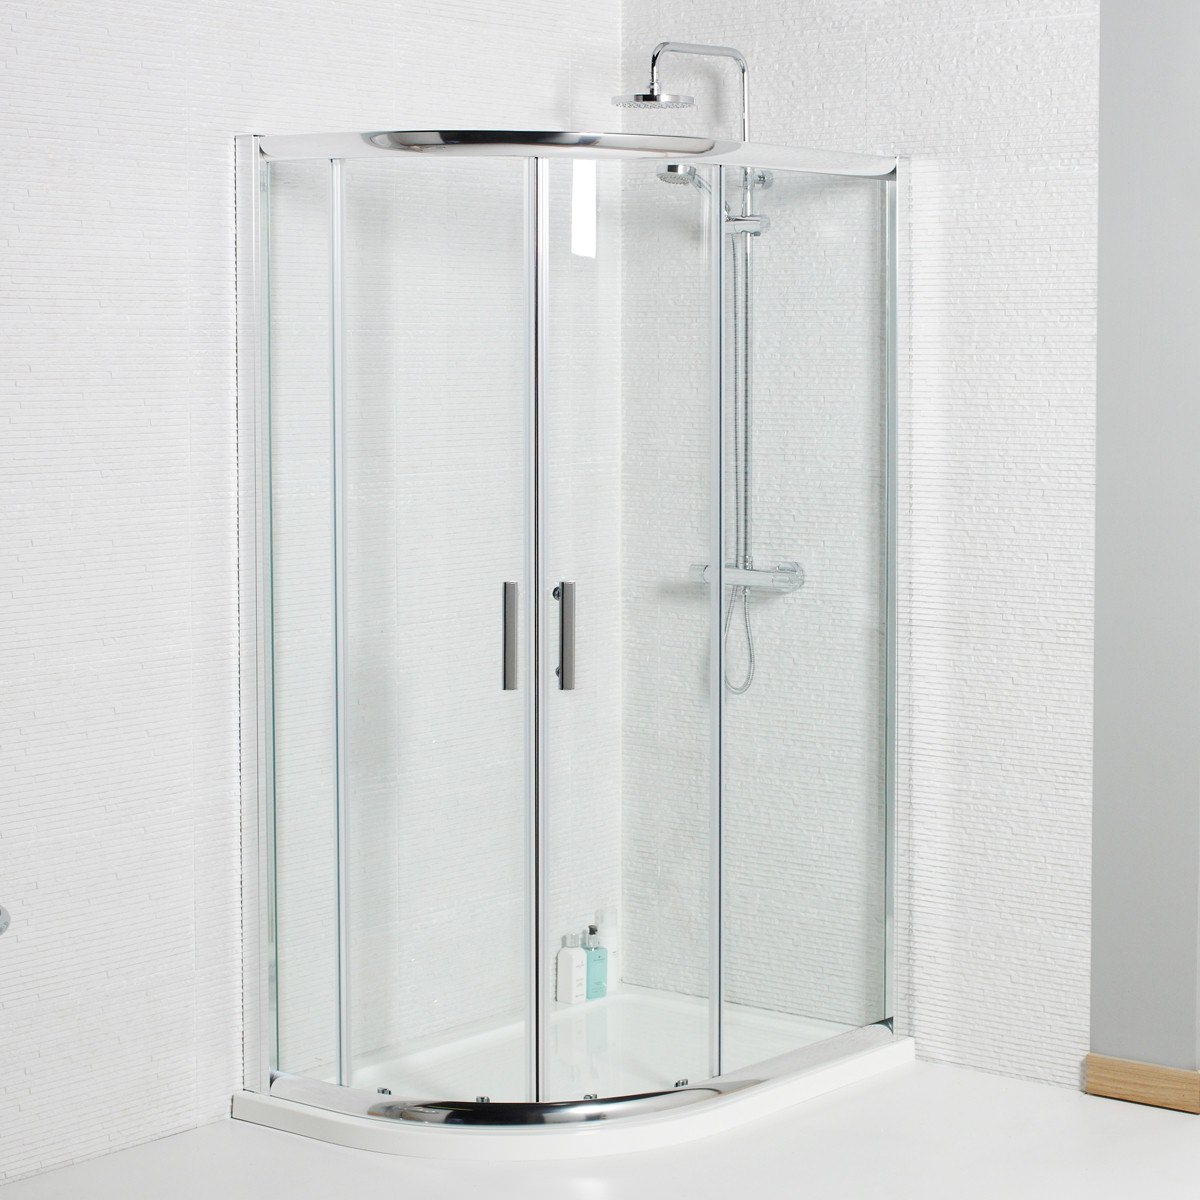 Kartell Koncept 900 x 760mm Offset Quadrant Shower Enclosure